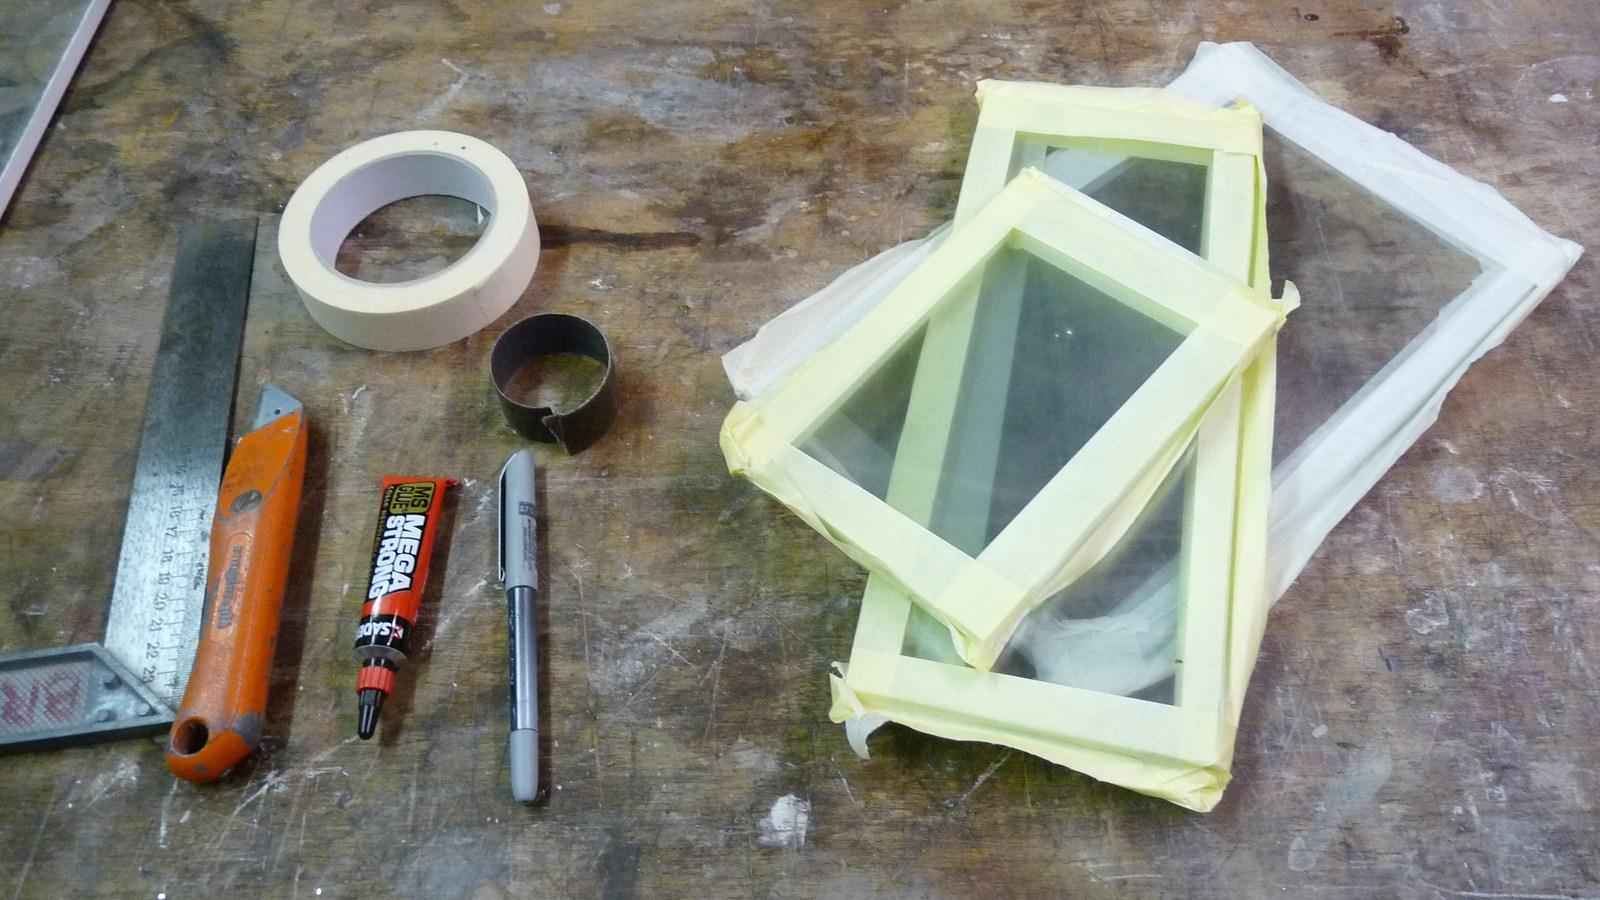 Fabriquer ses propres vitrines en verre 17071907261423134915156539